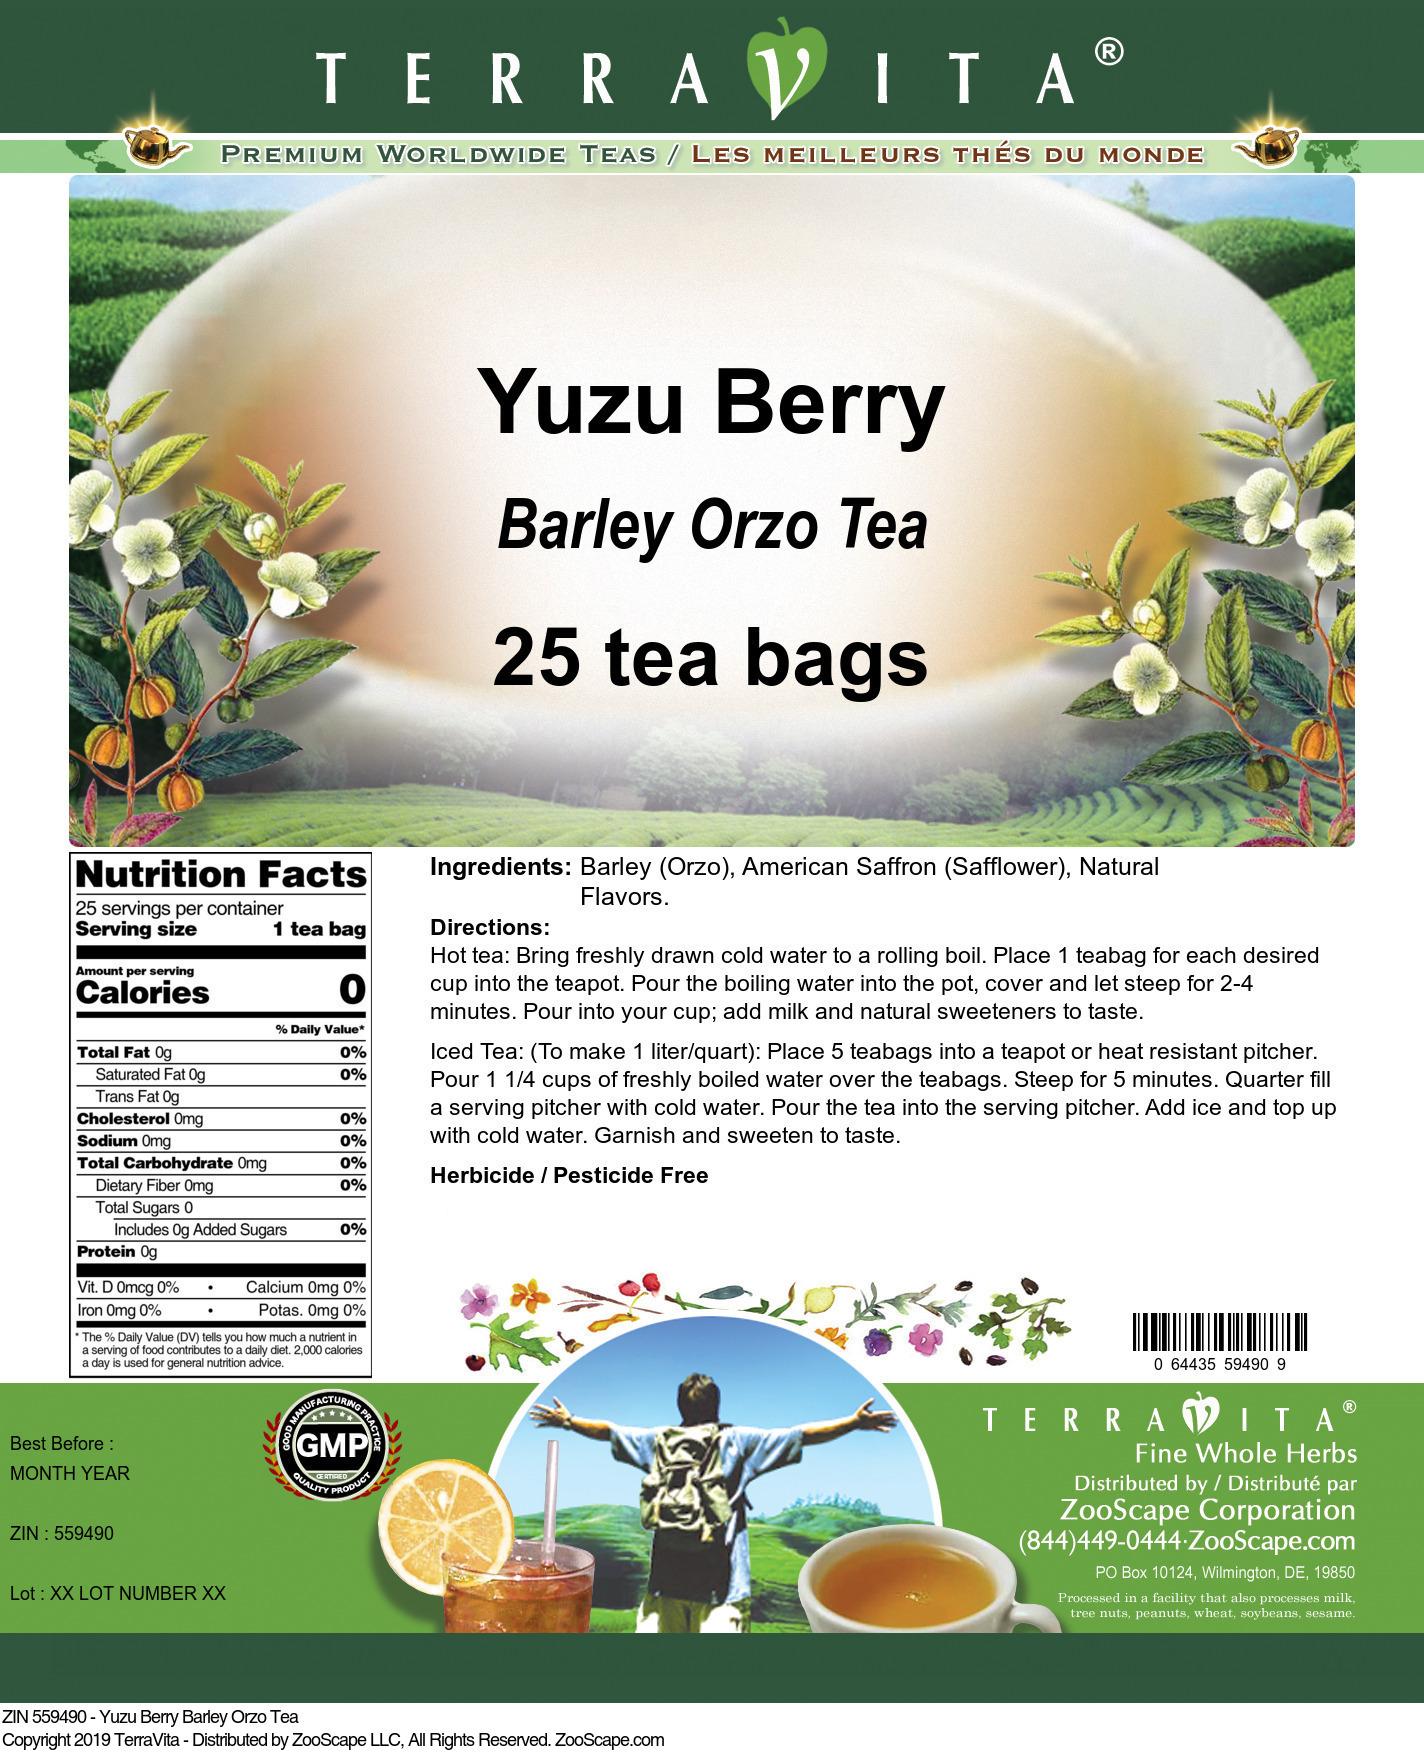 Yuzu Berry Barley Orzo Tea